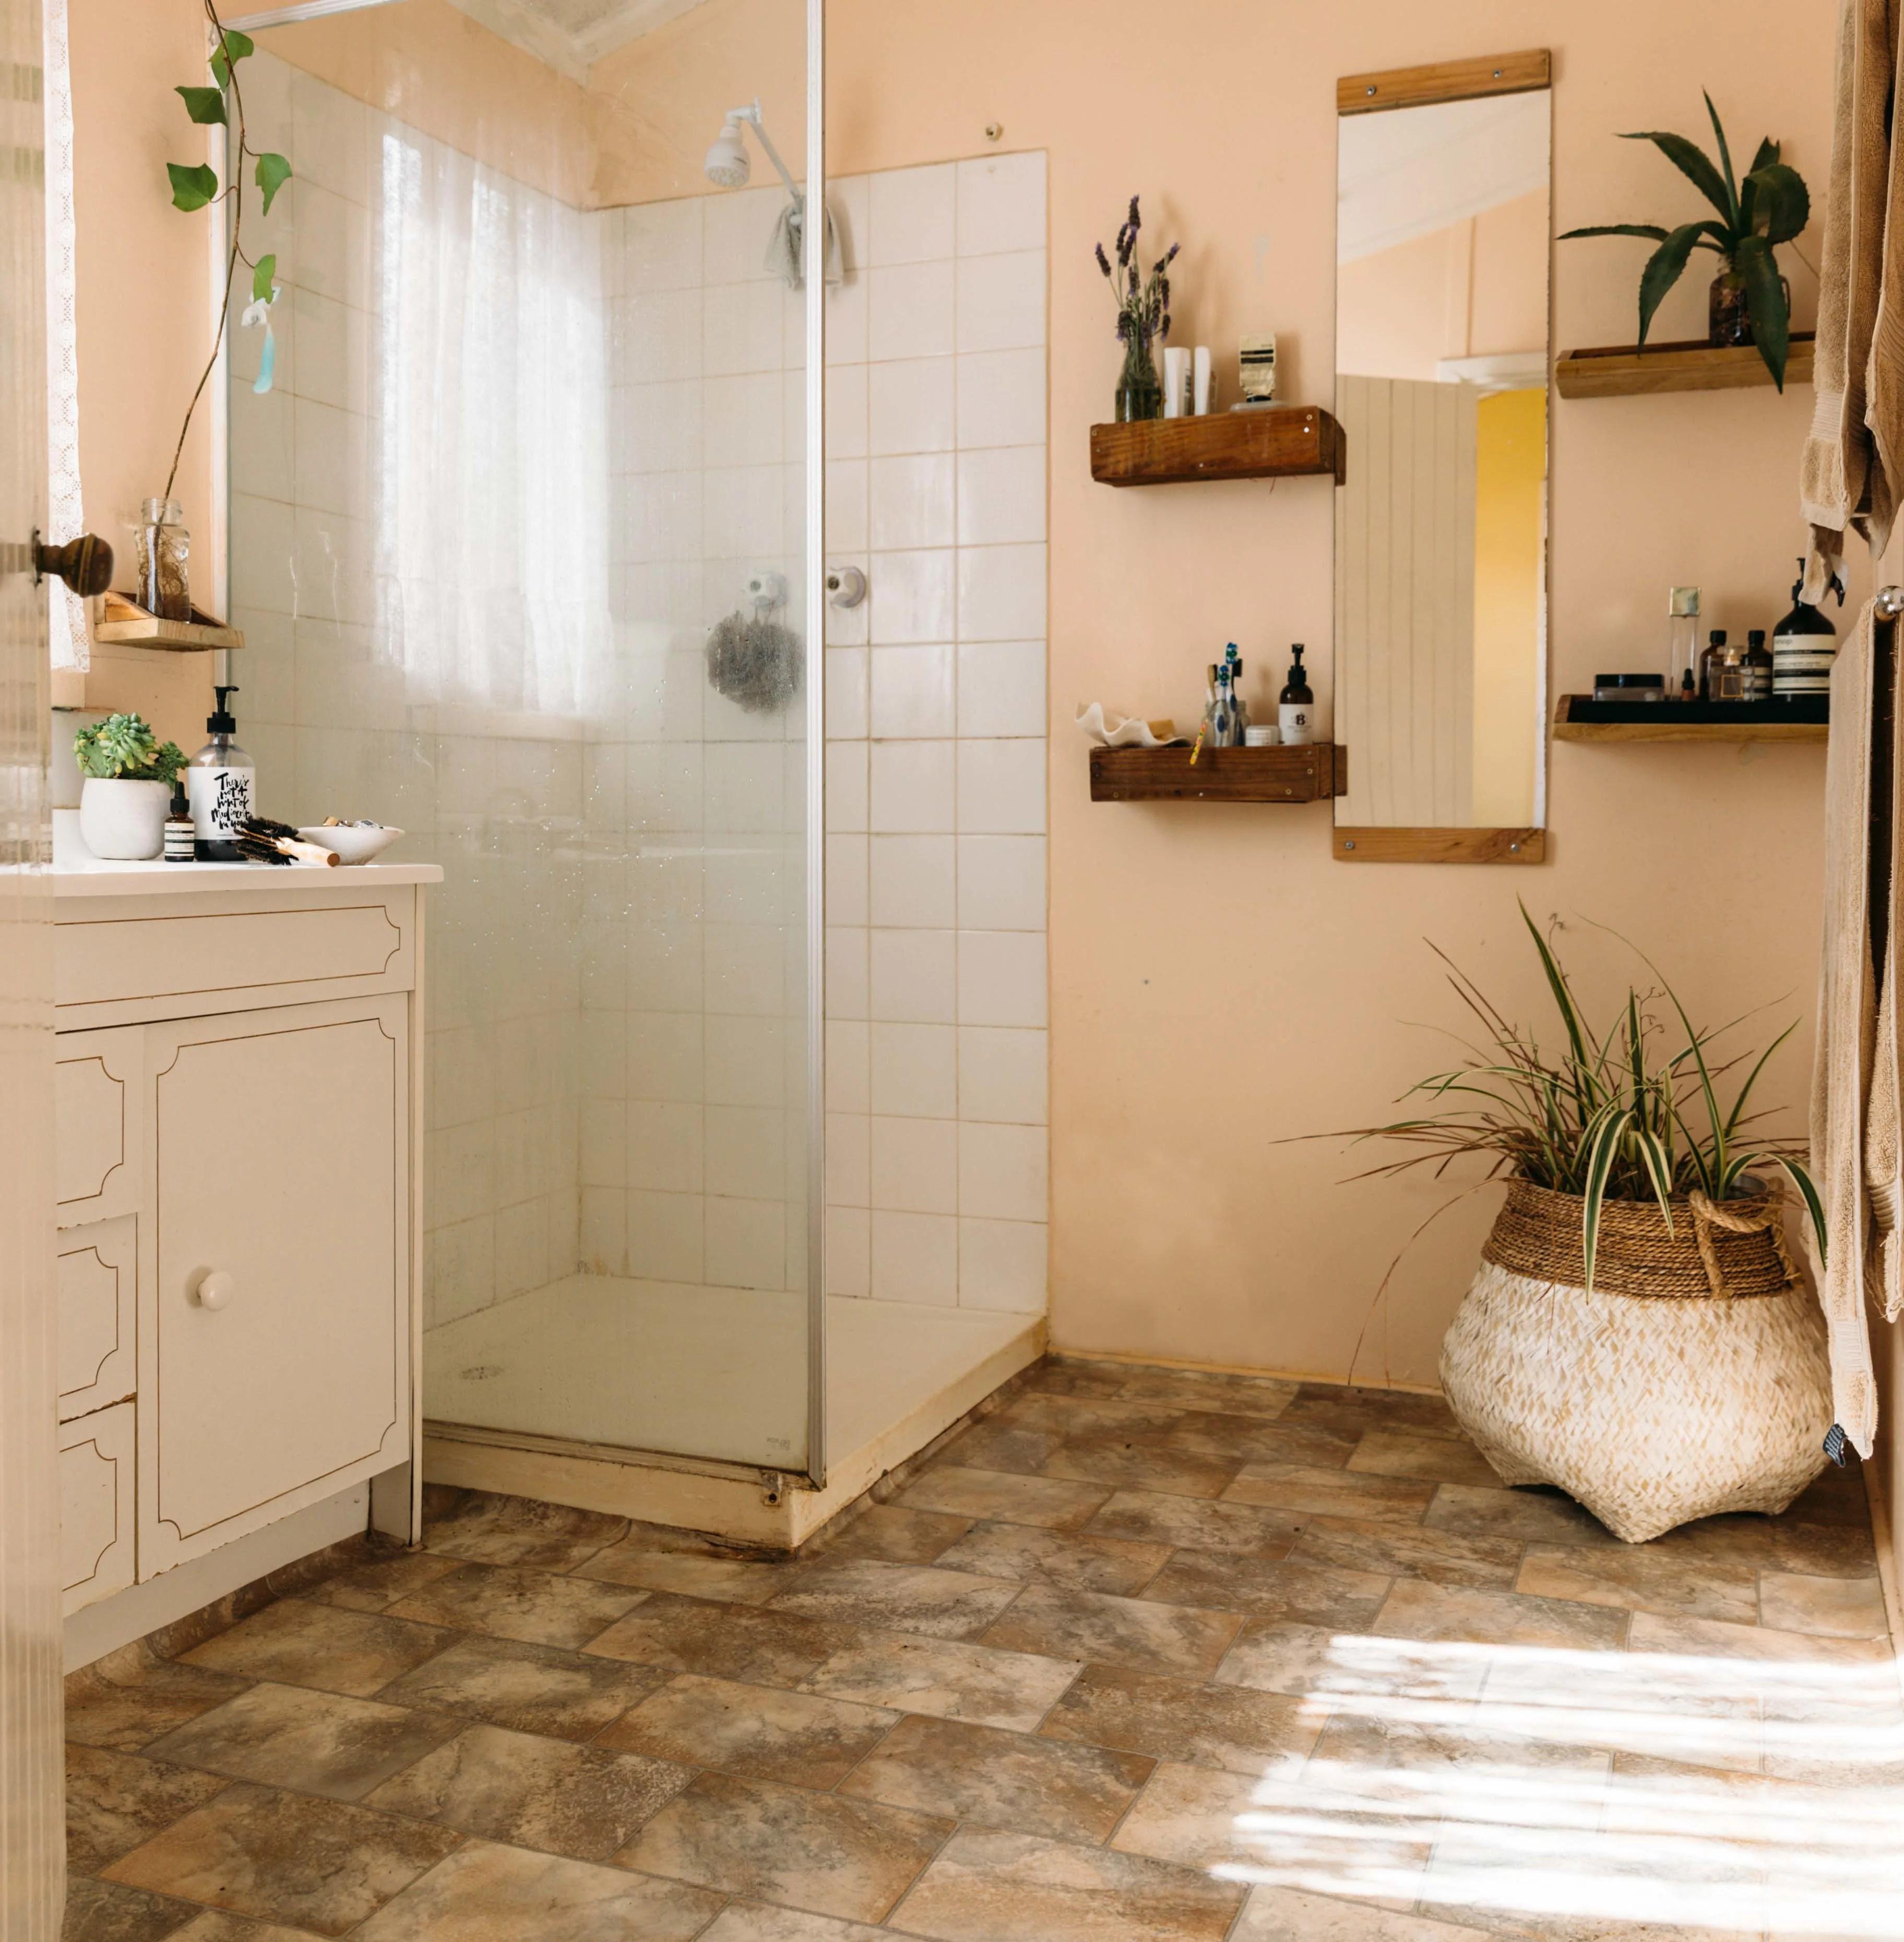 Small Bathroom Design & Storage Ideas | Apartment Therapy on Small Apartment Bathroom Storage Ideas  id=47948